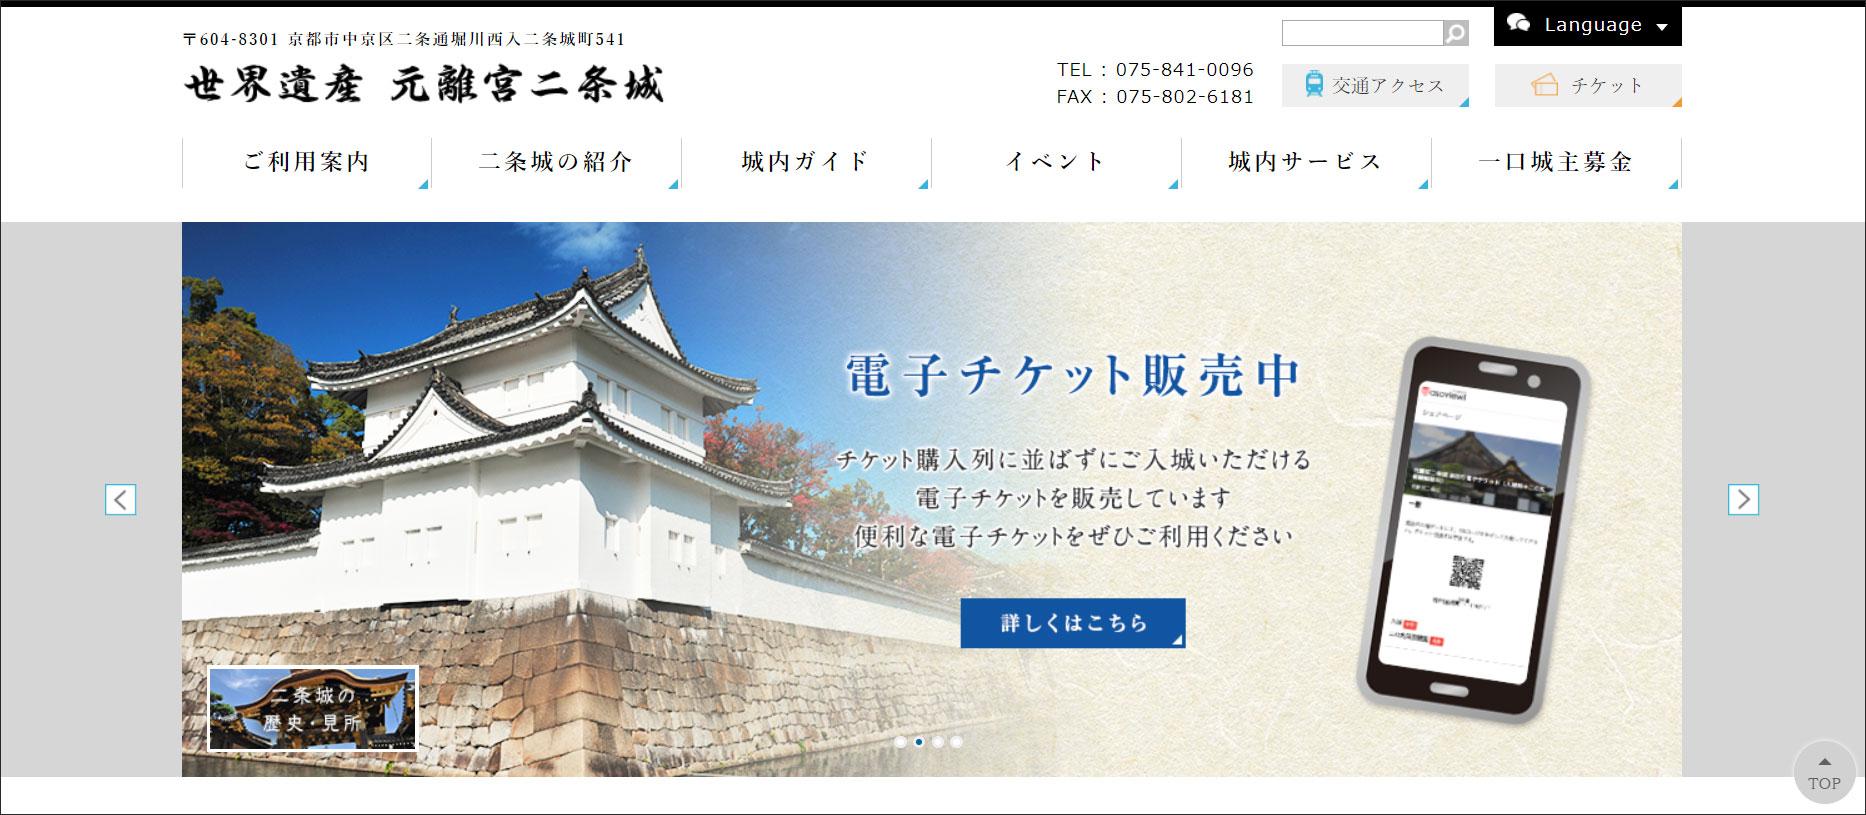 世界遺産 元離宮二条城 公式サイト